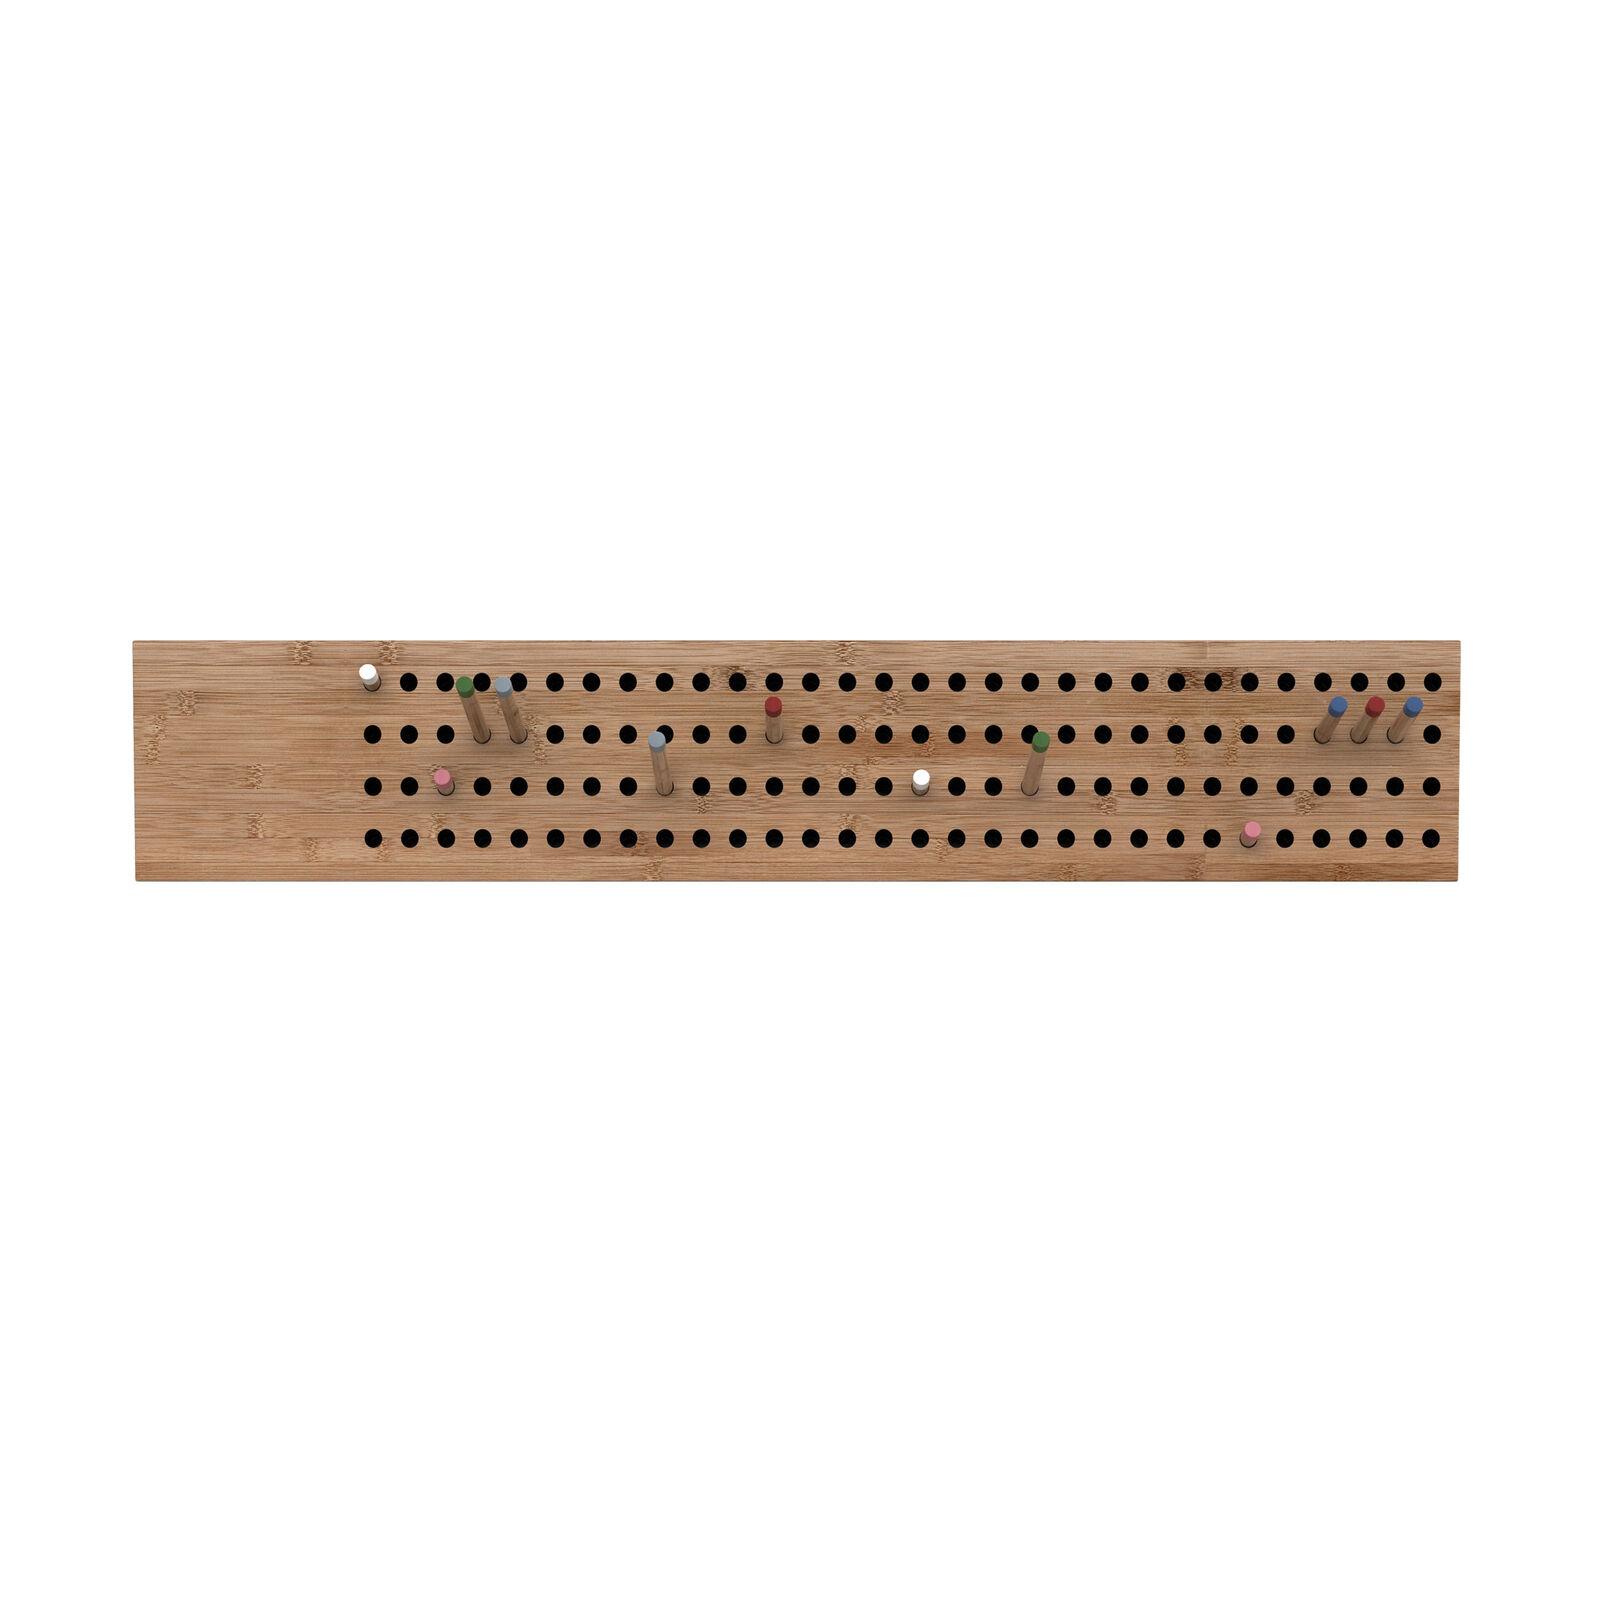 We Do Wood Scoreboard Scoreboard Scoreboard Garderobe horizontal Bambus 100 x 2 cm h 18 cm 492e86